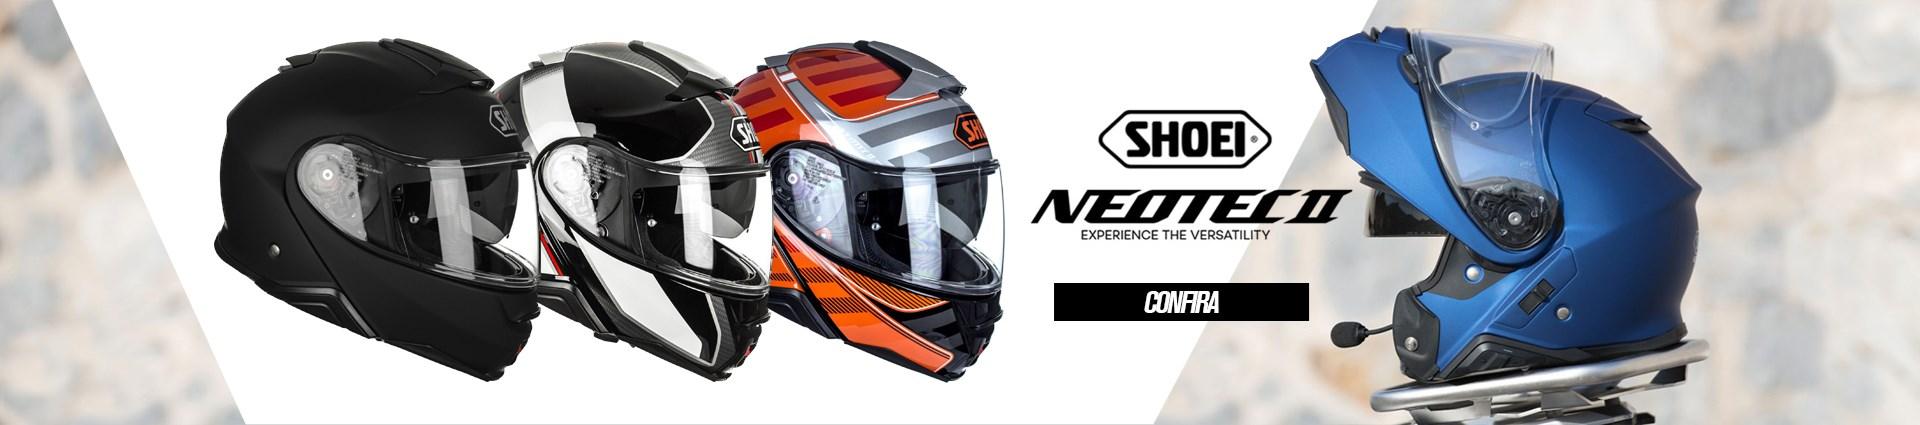 LP Shoei - Neotec 2